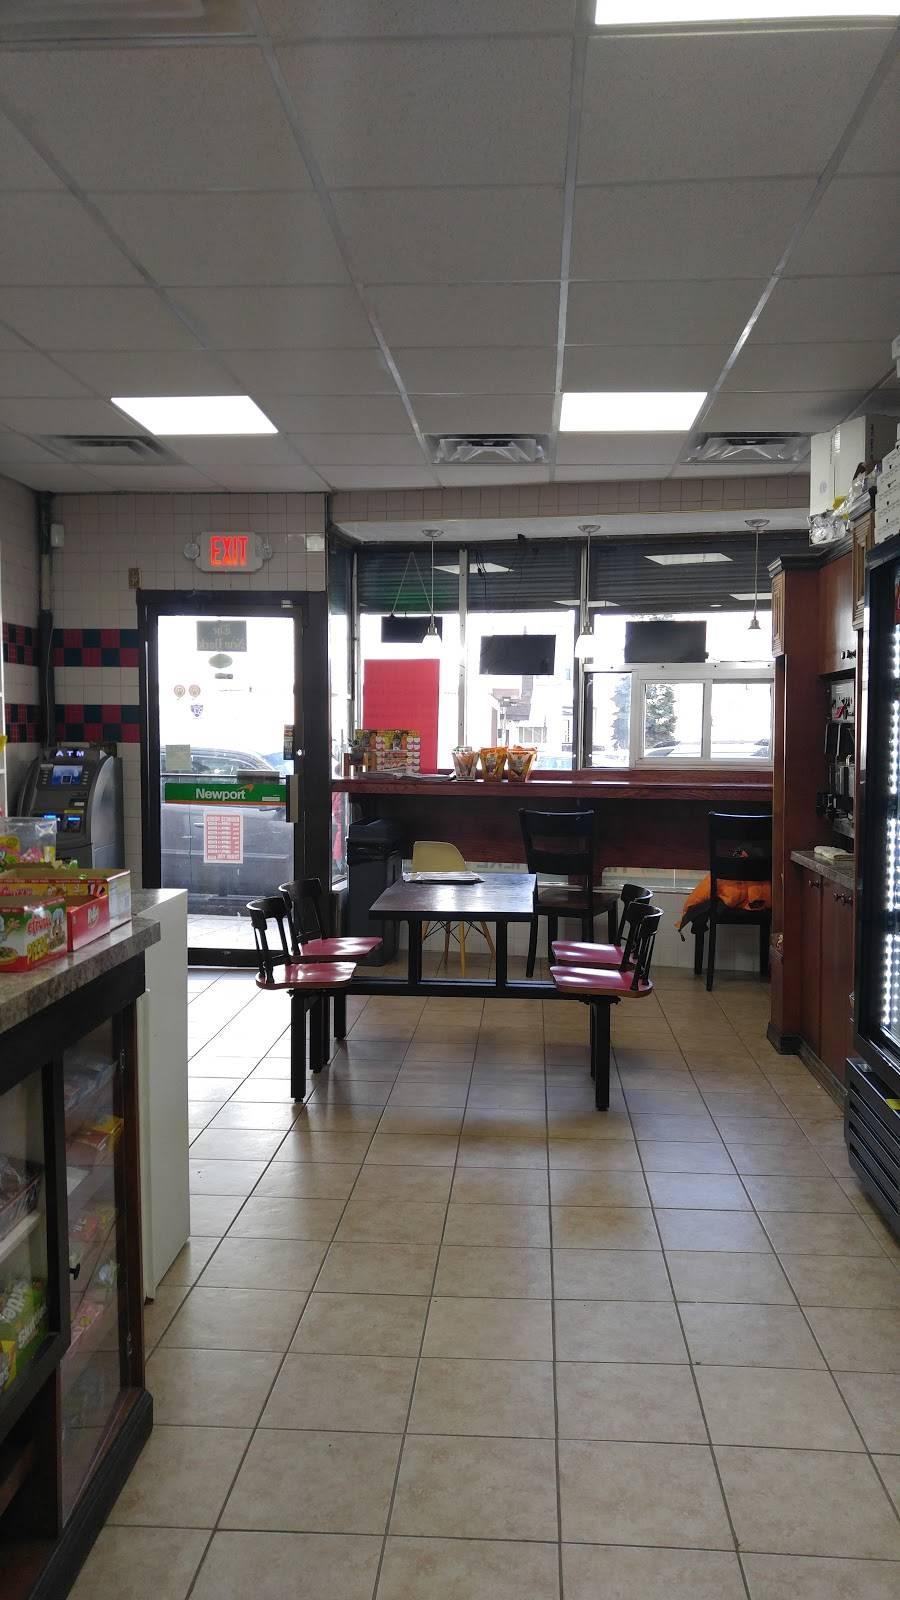 St. Mark's Pizzeria & Deli. | restaurant | 420 West Side Ave, Jersey City, NJ 07304, USA | 2014086222 OR +1 201-408-6222